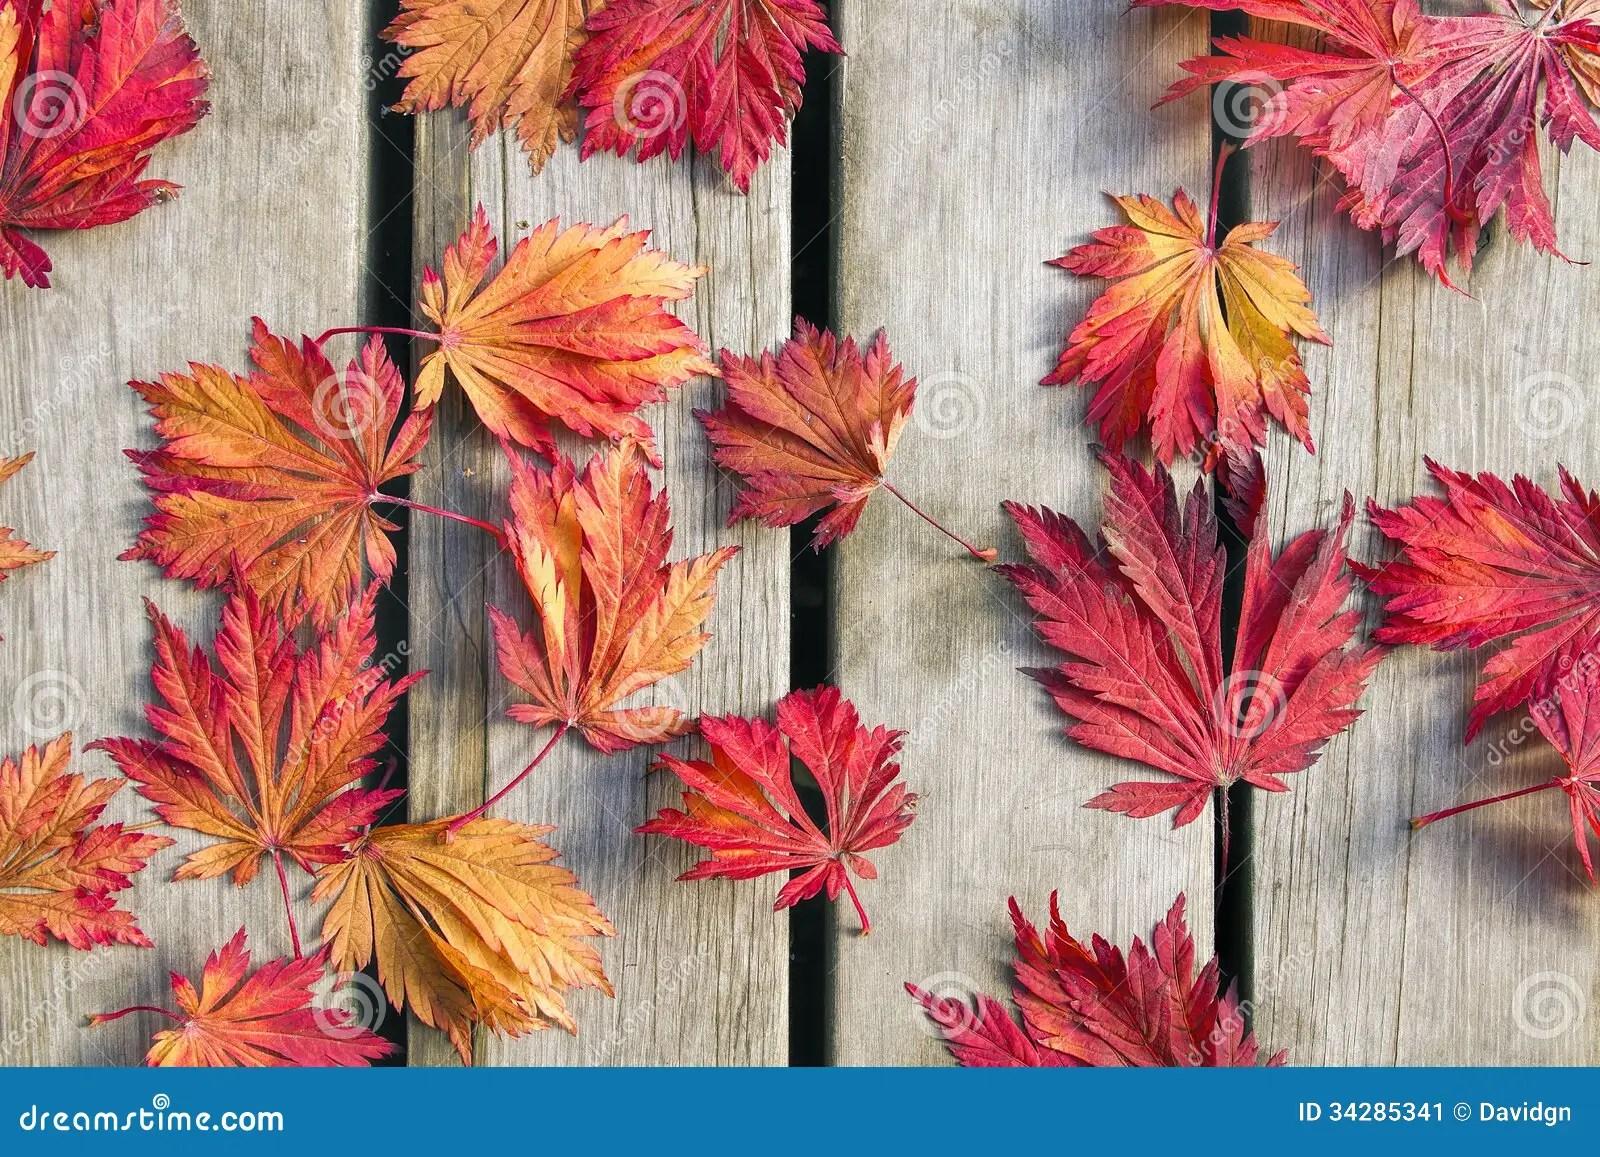 Fall Leaves Wallpaper Border Japanese Maple Tree Leaves On Wood Deck Stock Image